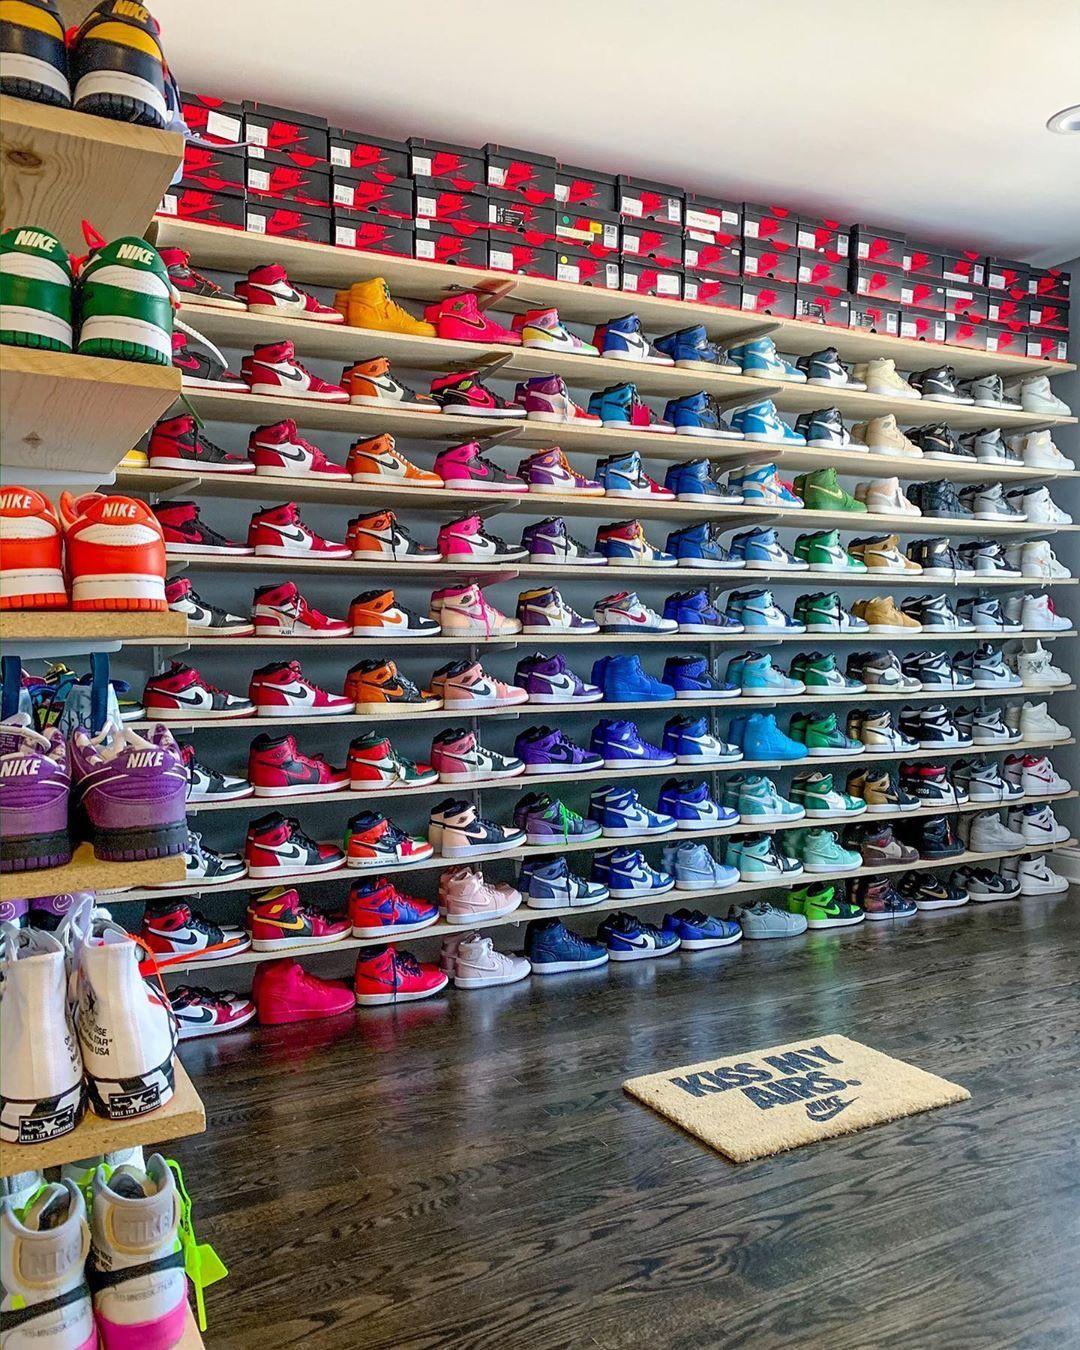 Multitud Reembolso Dios  Pin by Taichu Hoyos on shoes | Jordan shoes wallpaper, Jordan shoes girls,  Nike shoes jordans